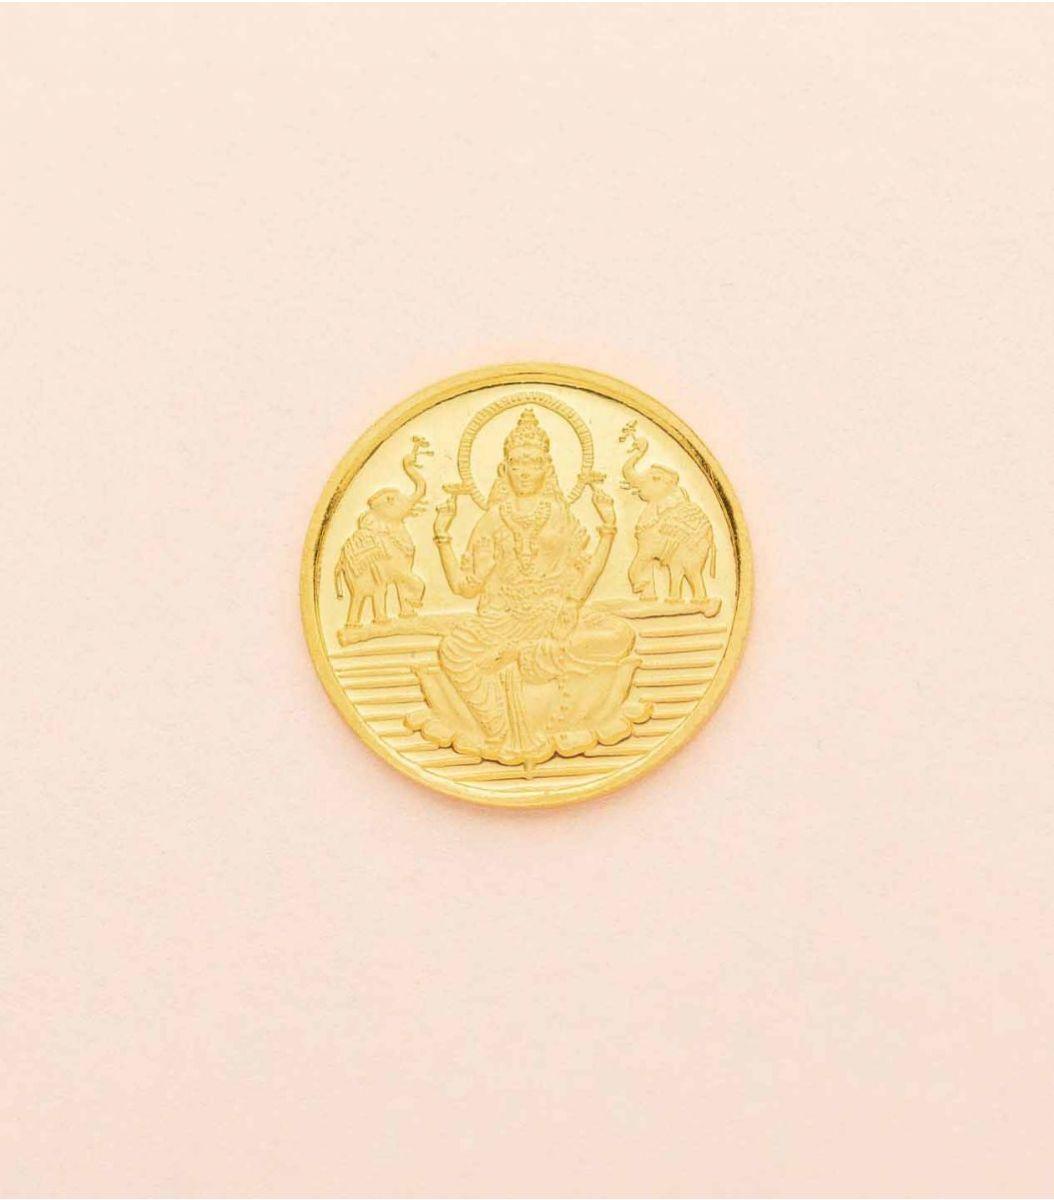 Gold Laxmi Coin-3GM